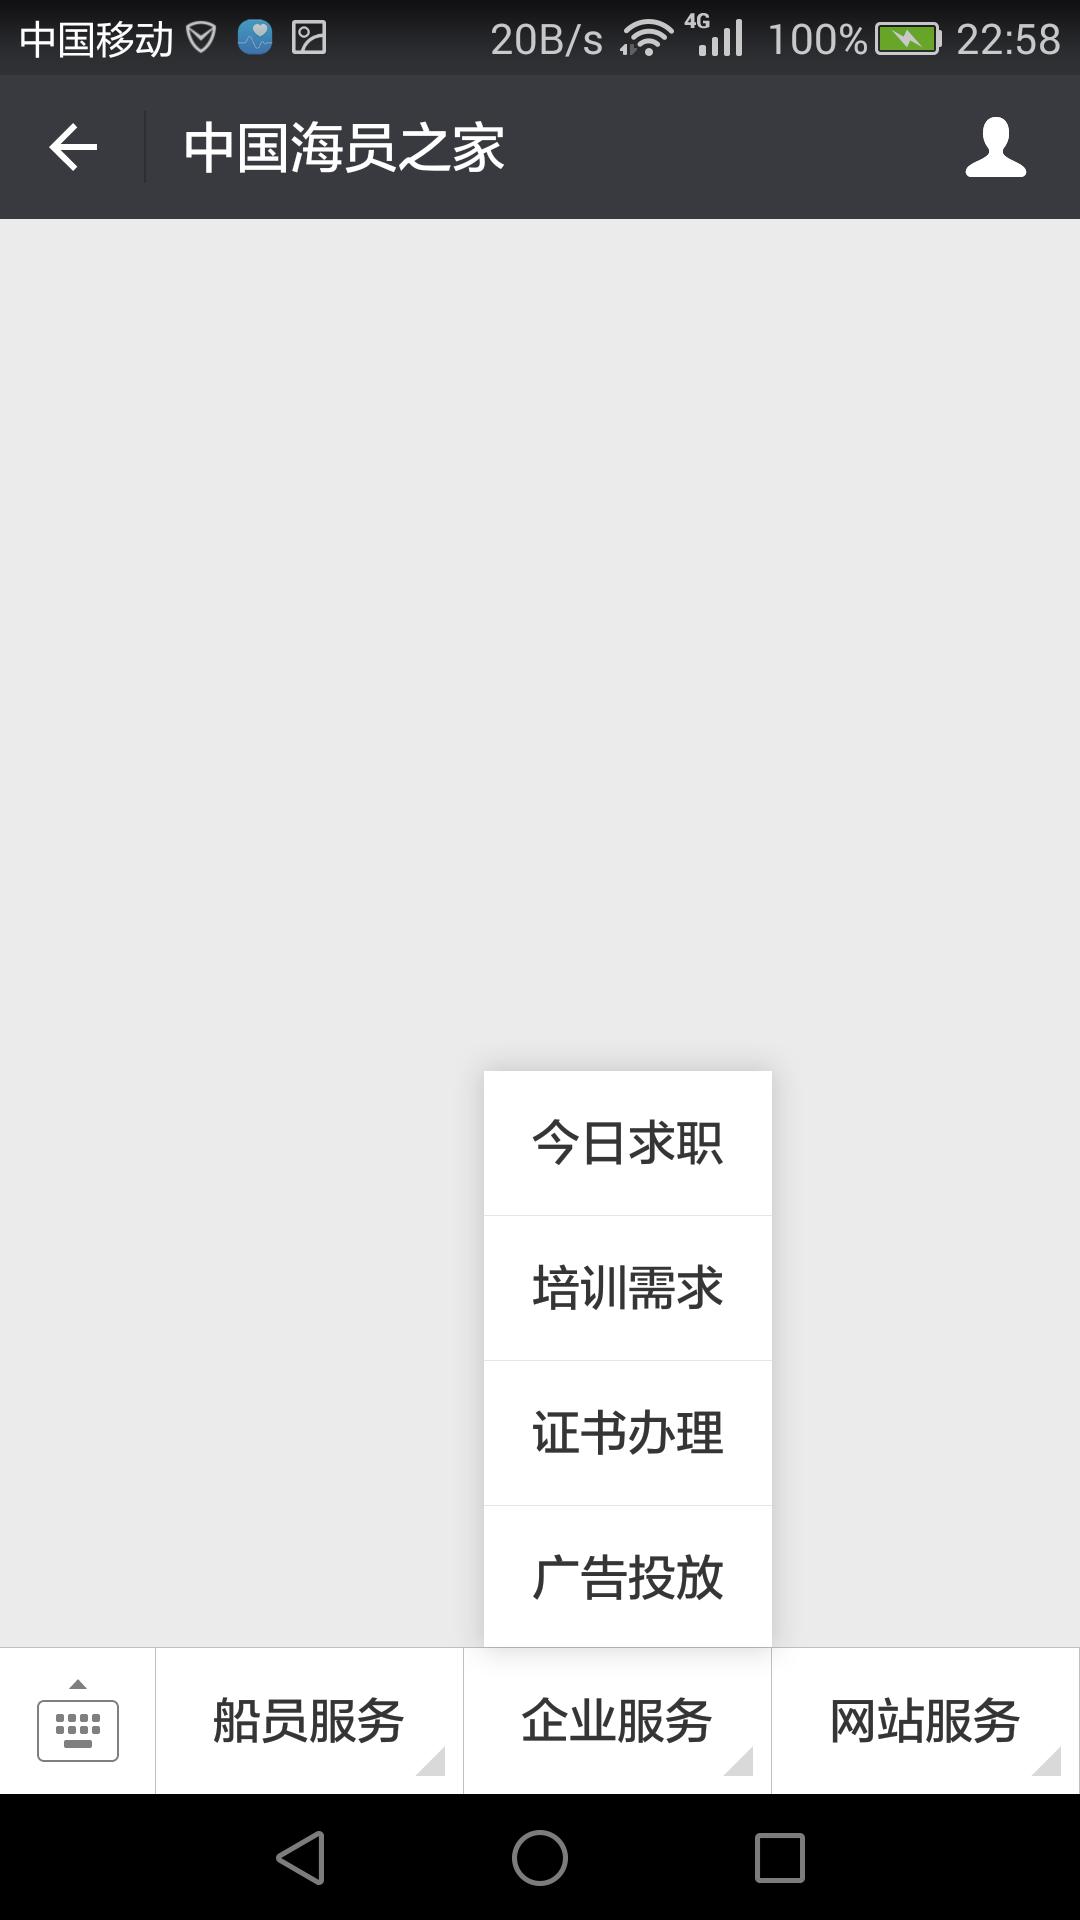 Screenshot_2016-06-10-22-58-59.png